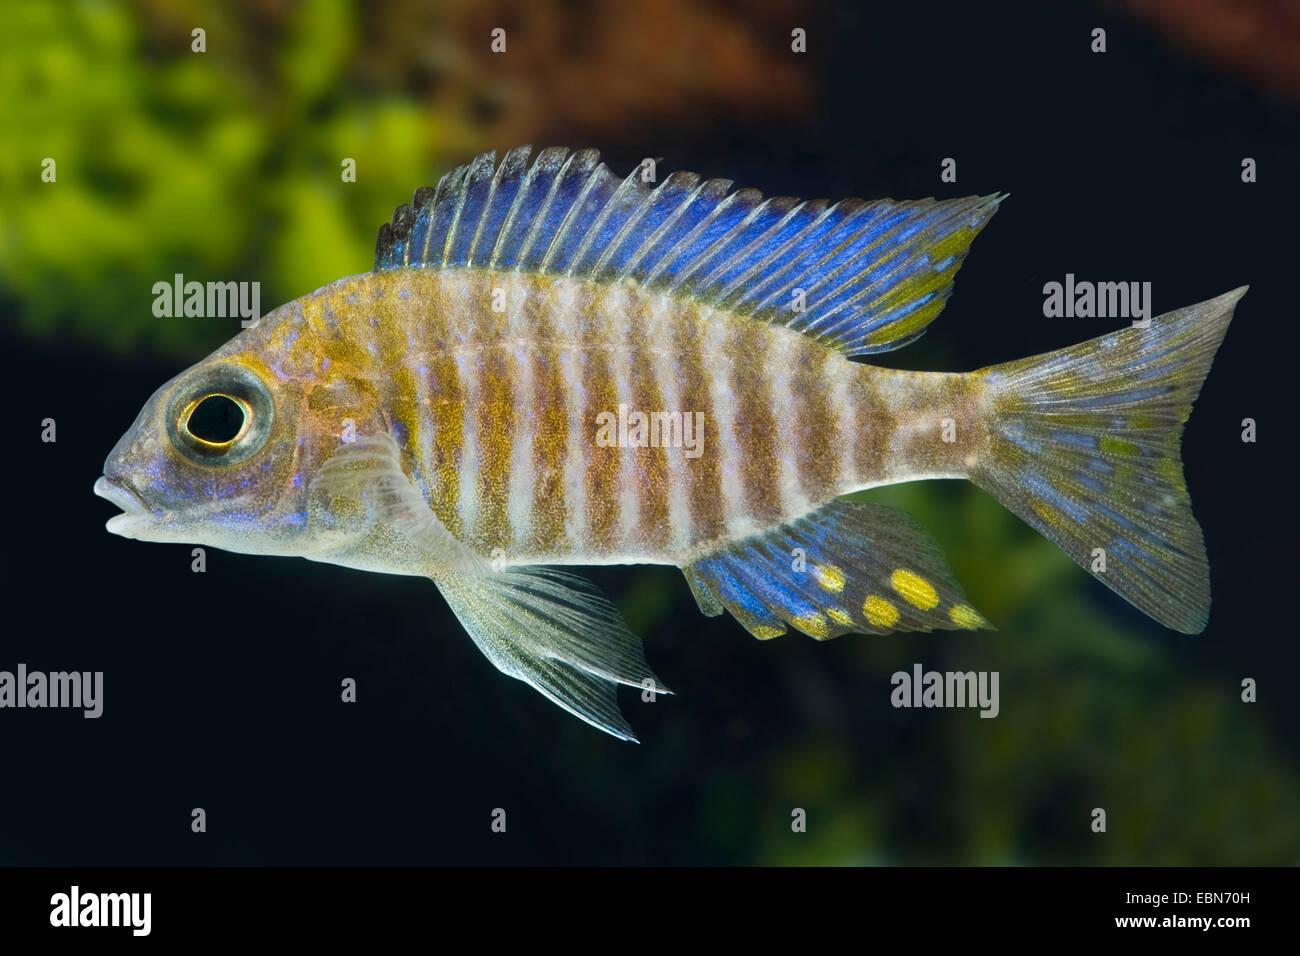 Northern Midnight-Aulonocara (Aulonocara ethelwynnae), swimming - Stock Image